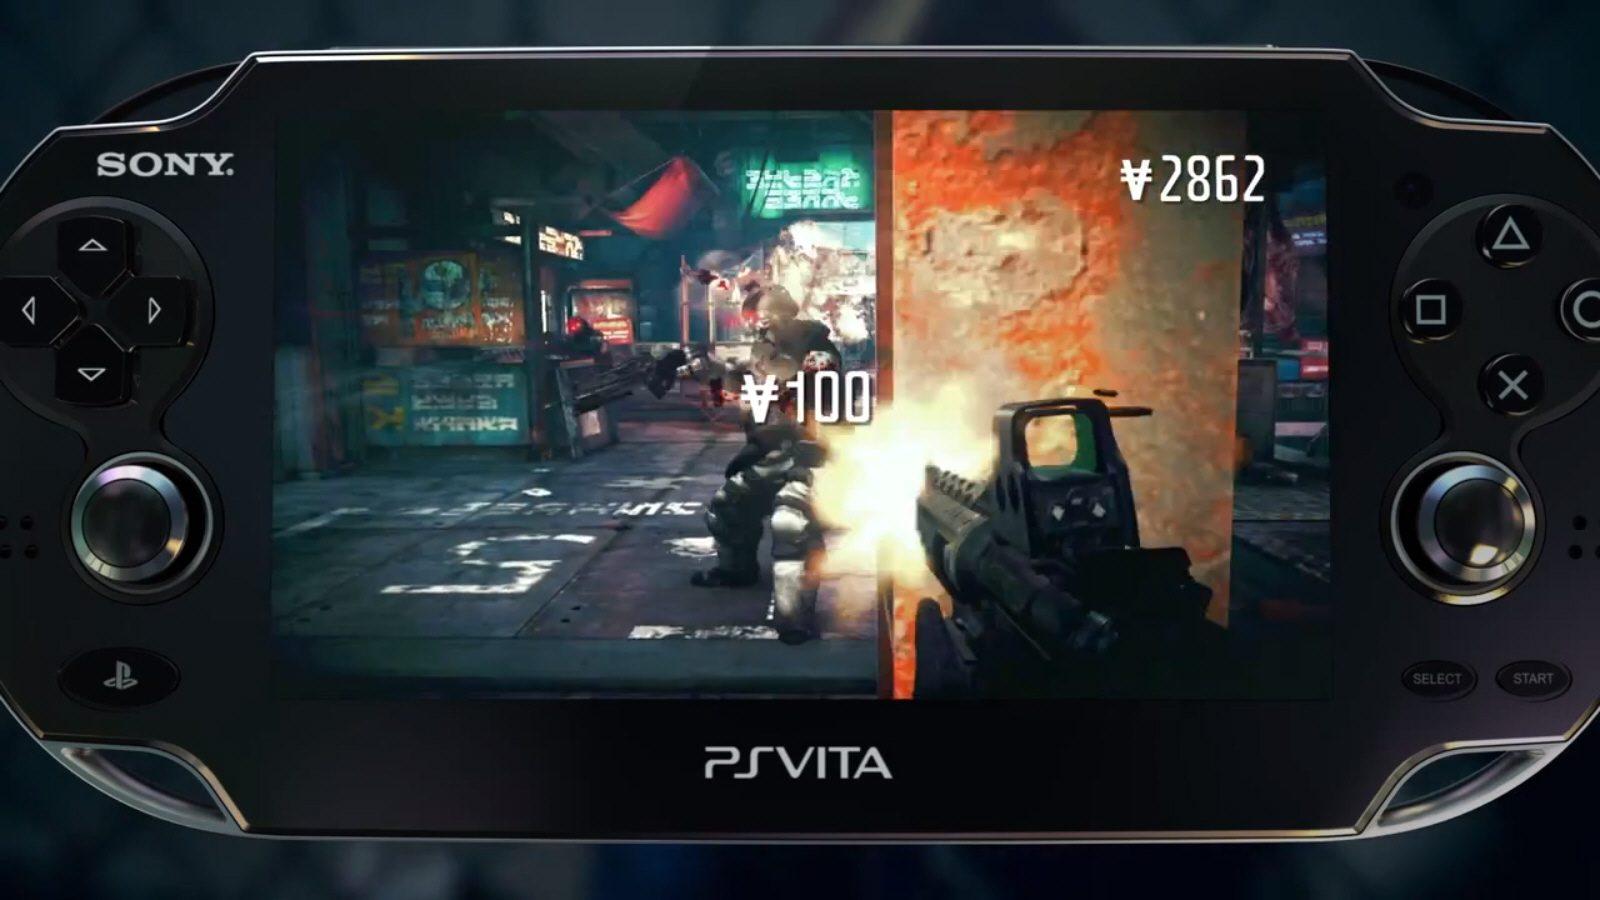 Sony Ps Vita Games : Games console sucessor do ps vita pode ser anunciado